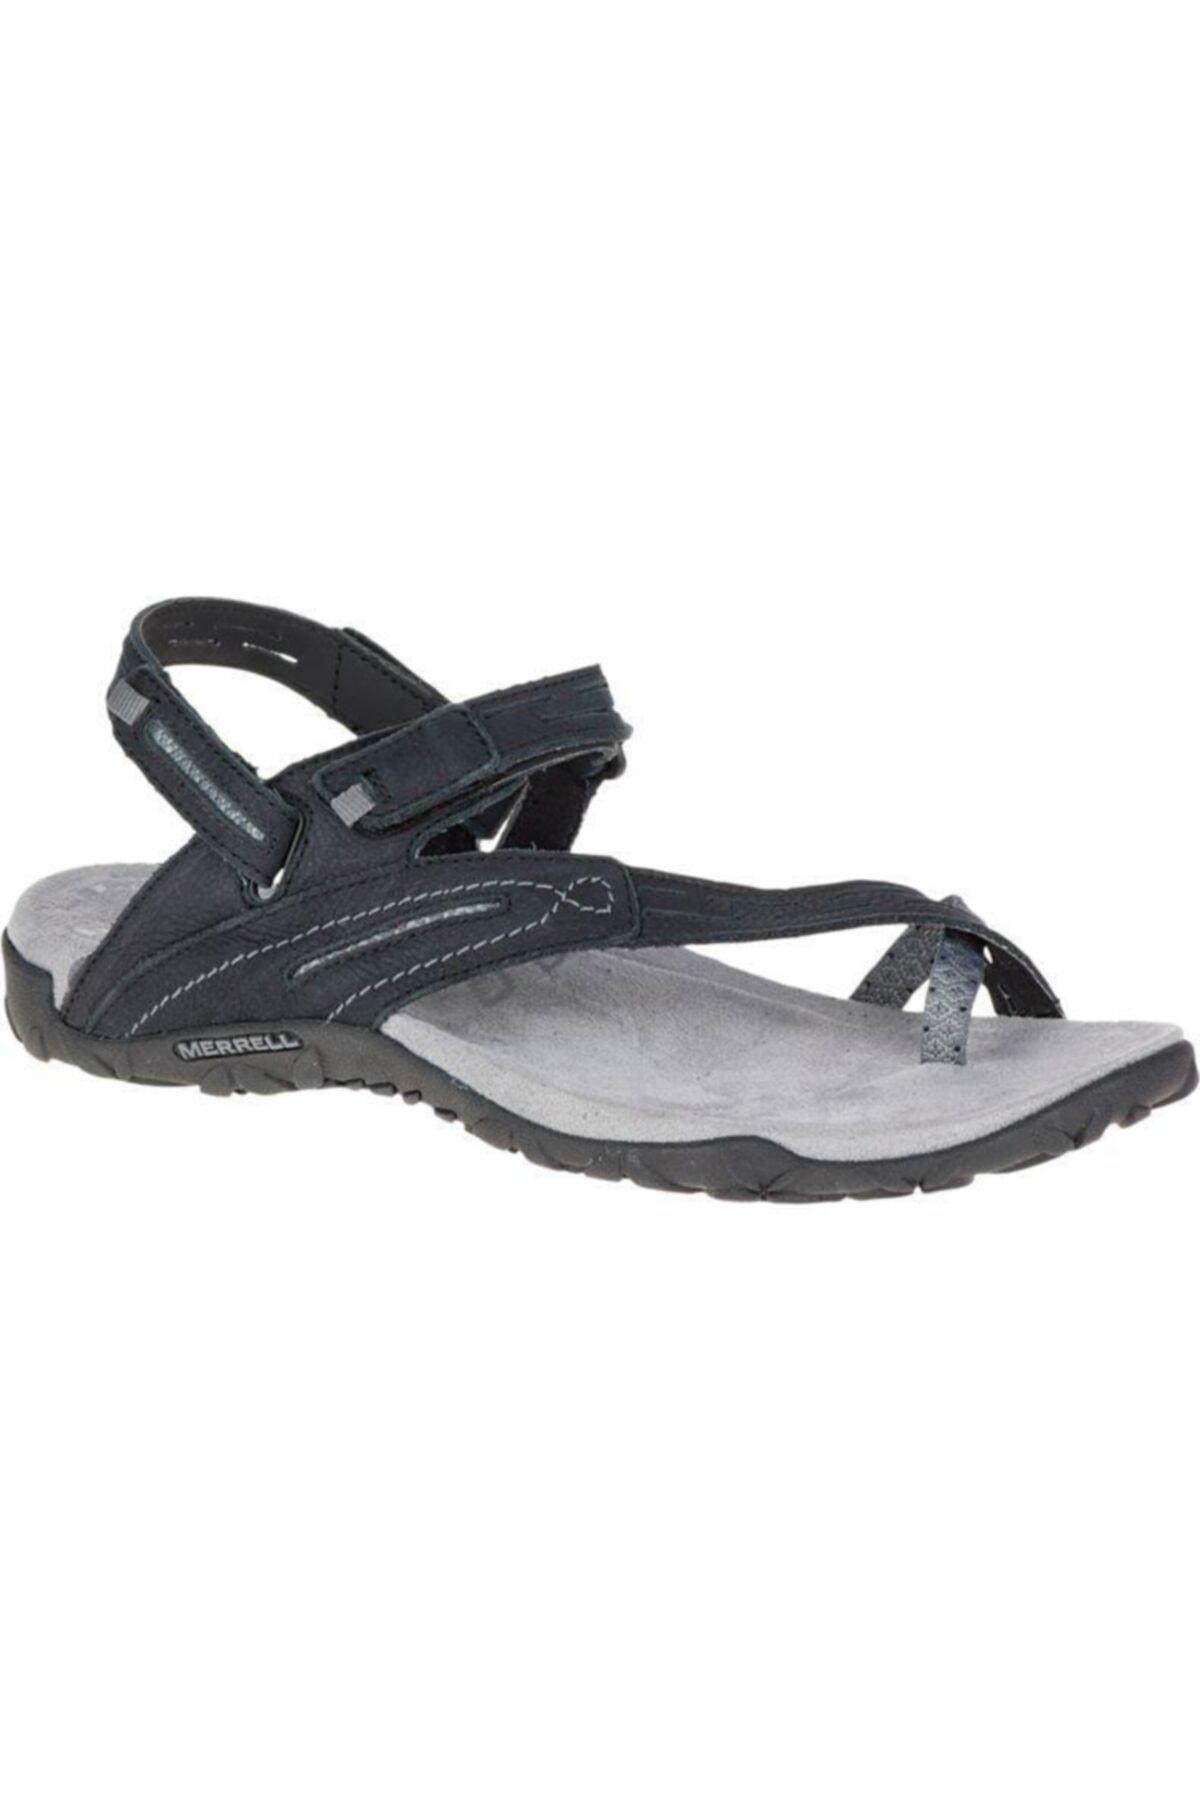 Merrell J55366 Terran Convert 2 Black Kadın Sandalet 1